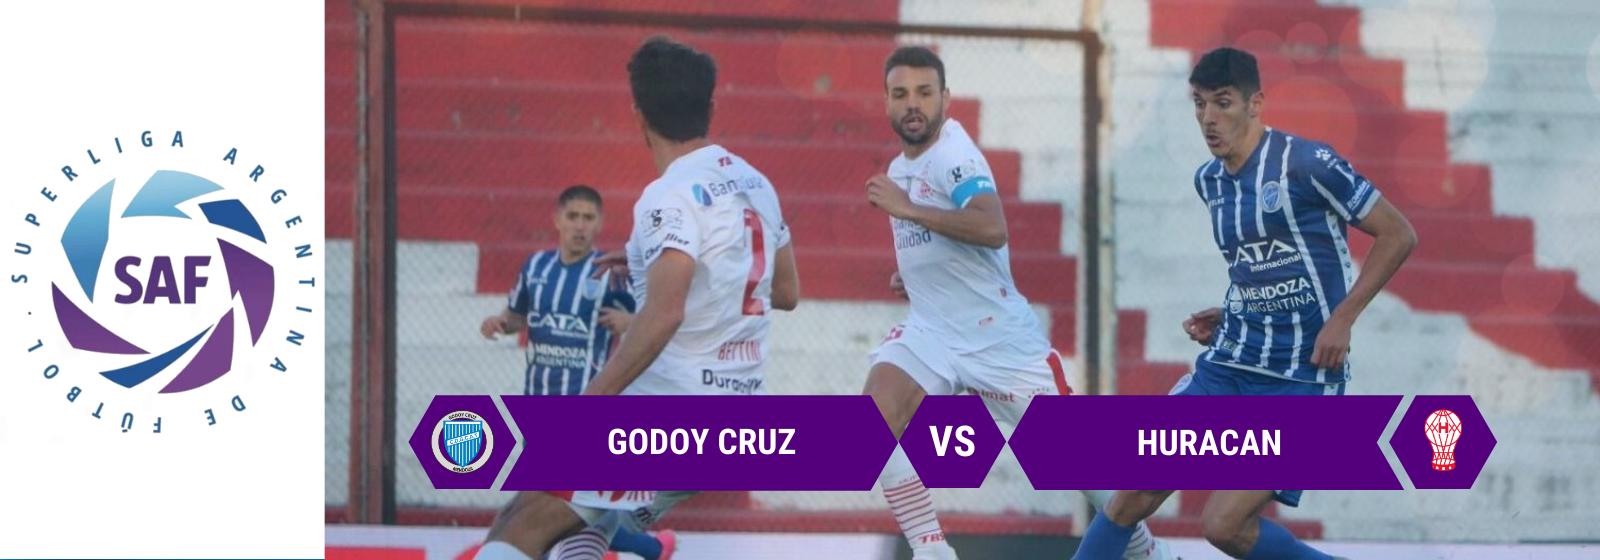 Asianconnect: Godoy Cruz vs Huracan Odds for February 10, 2020